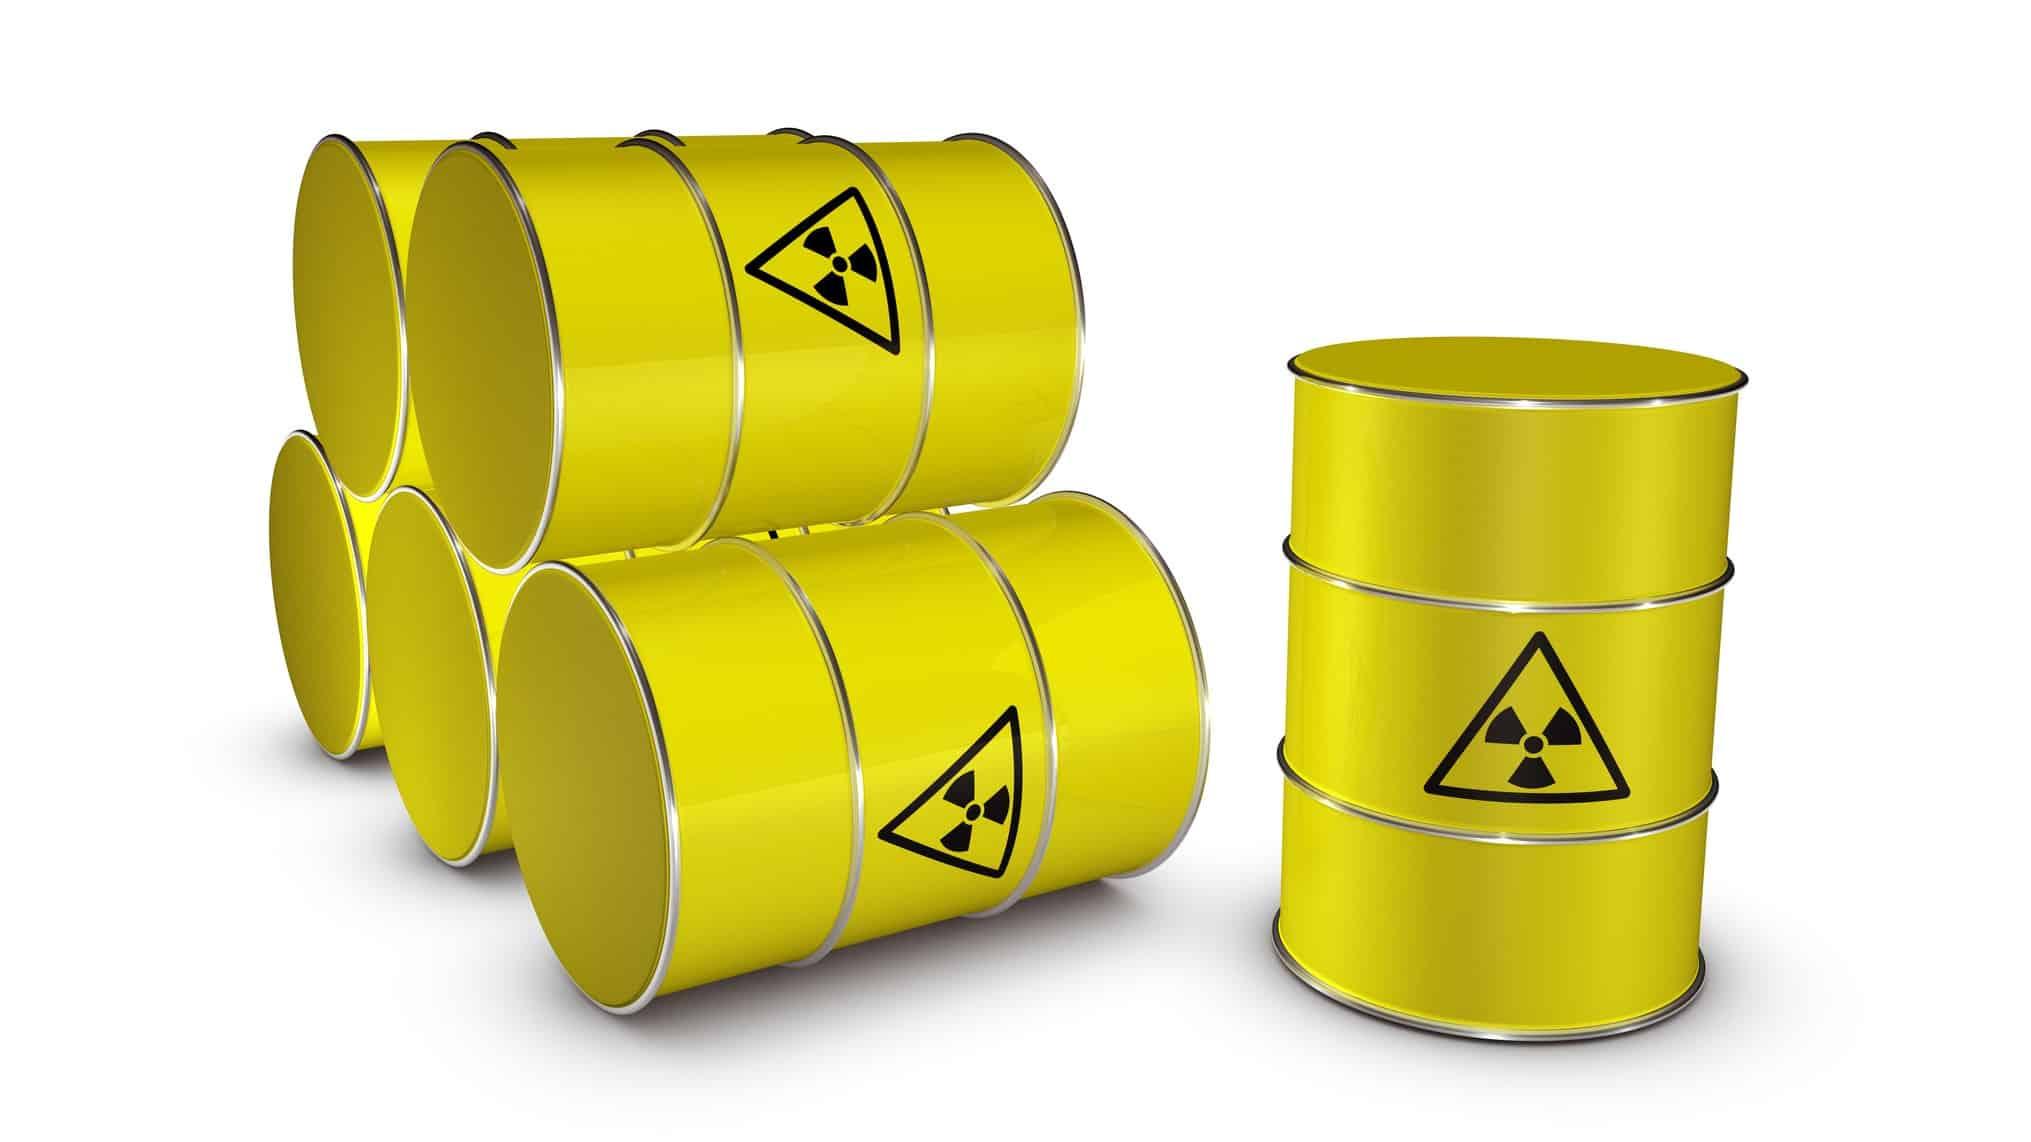 ASX uranium shares represented by yellow barrels of uranium